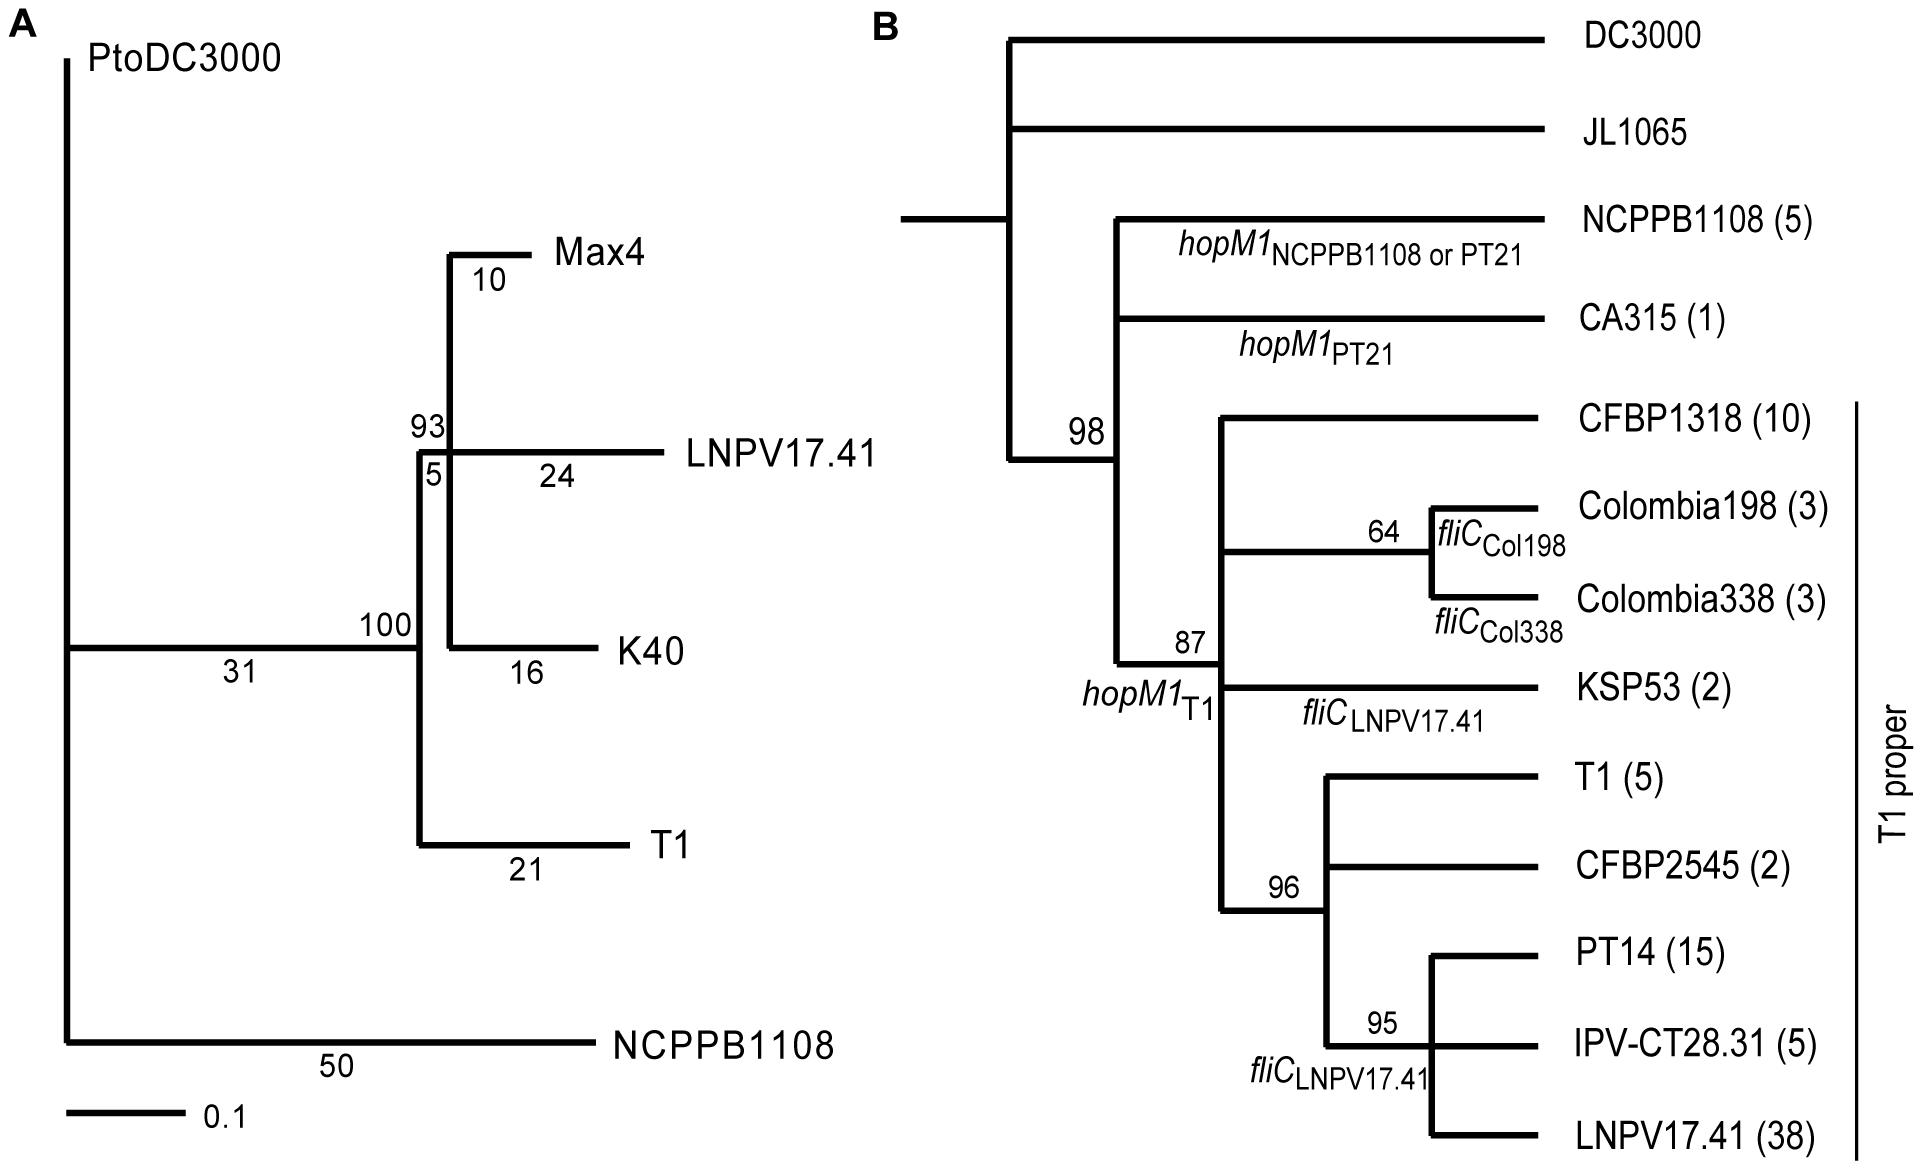 Phylogenetic trees based on SNPs reveal the evolutionary relationship between T1-like <i>Pto</i> strains.